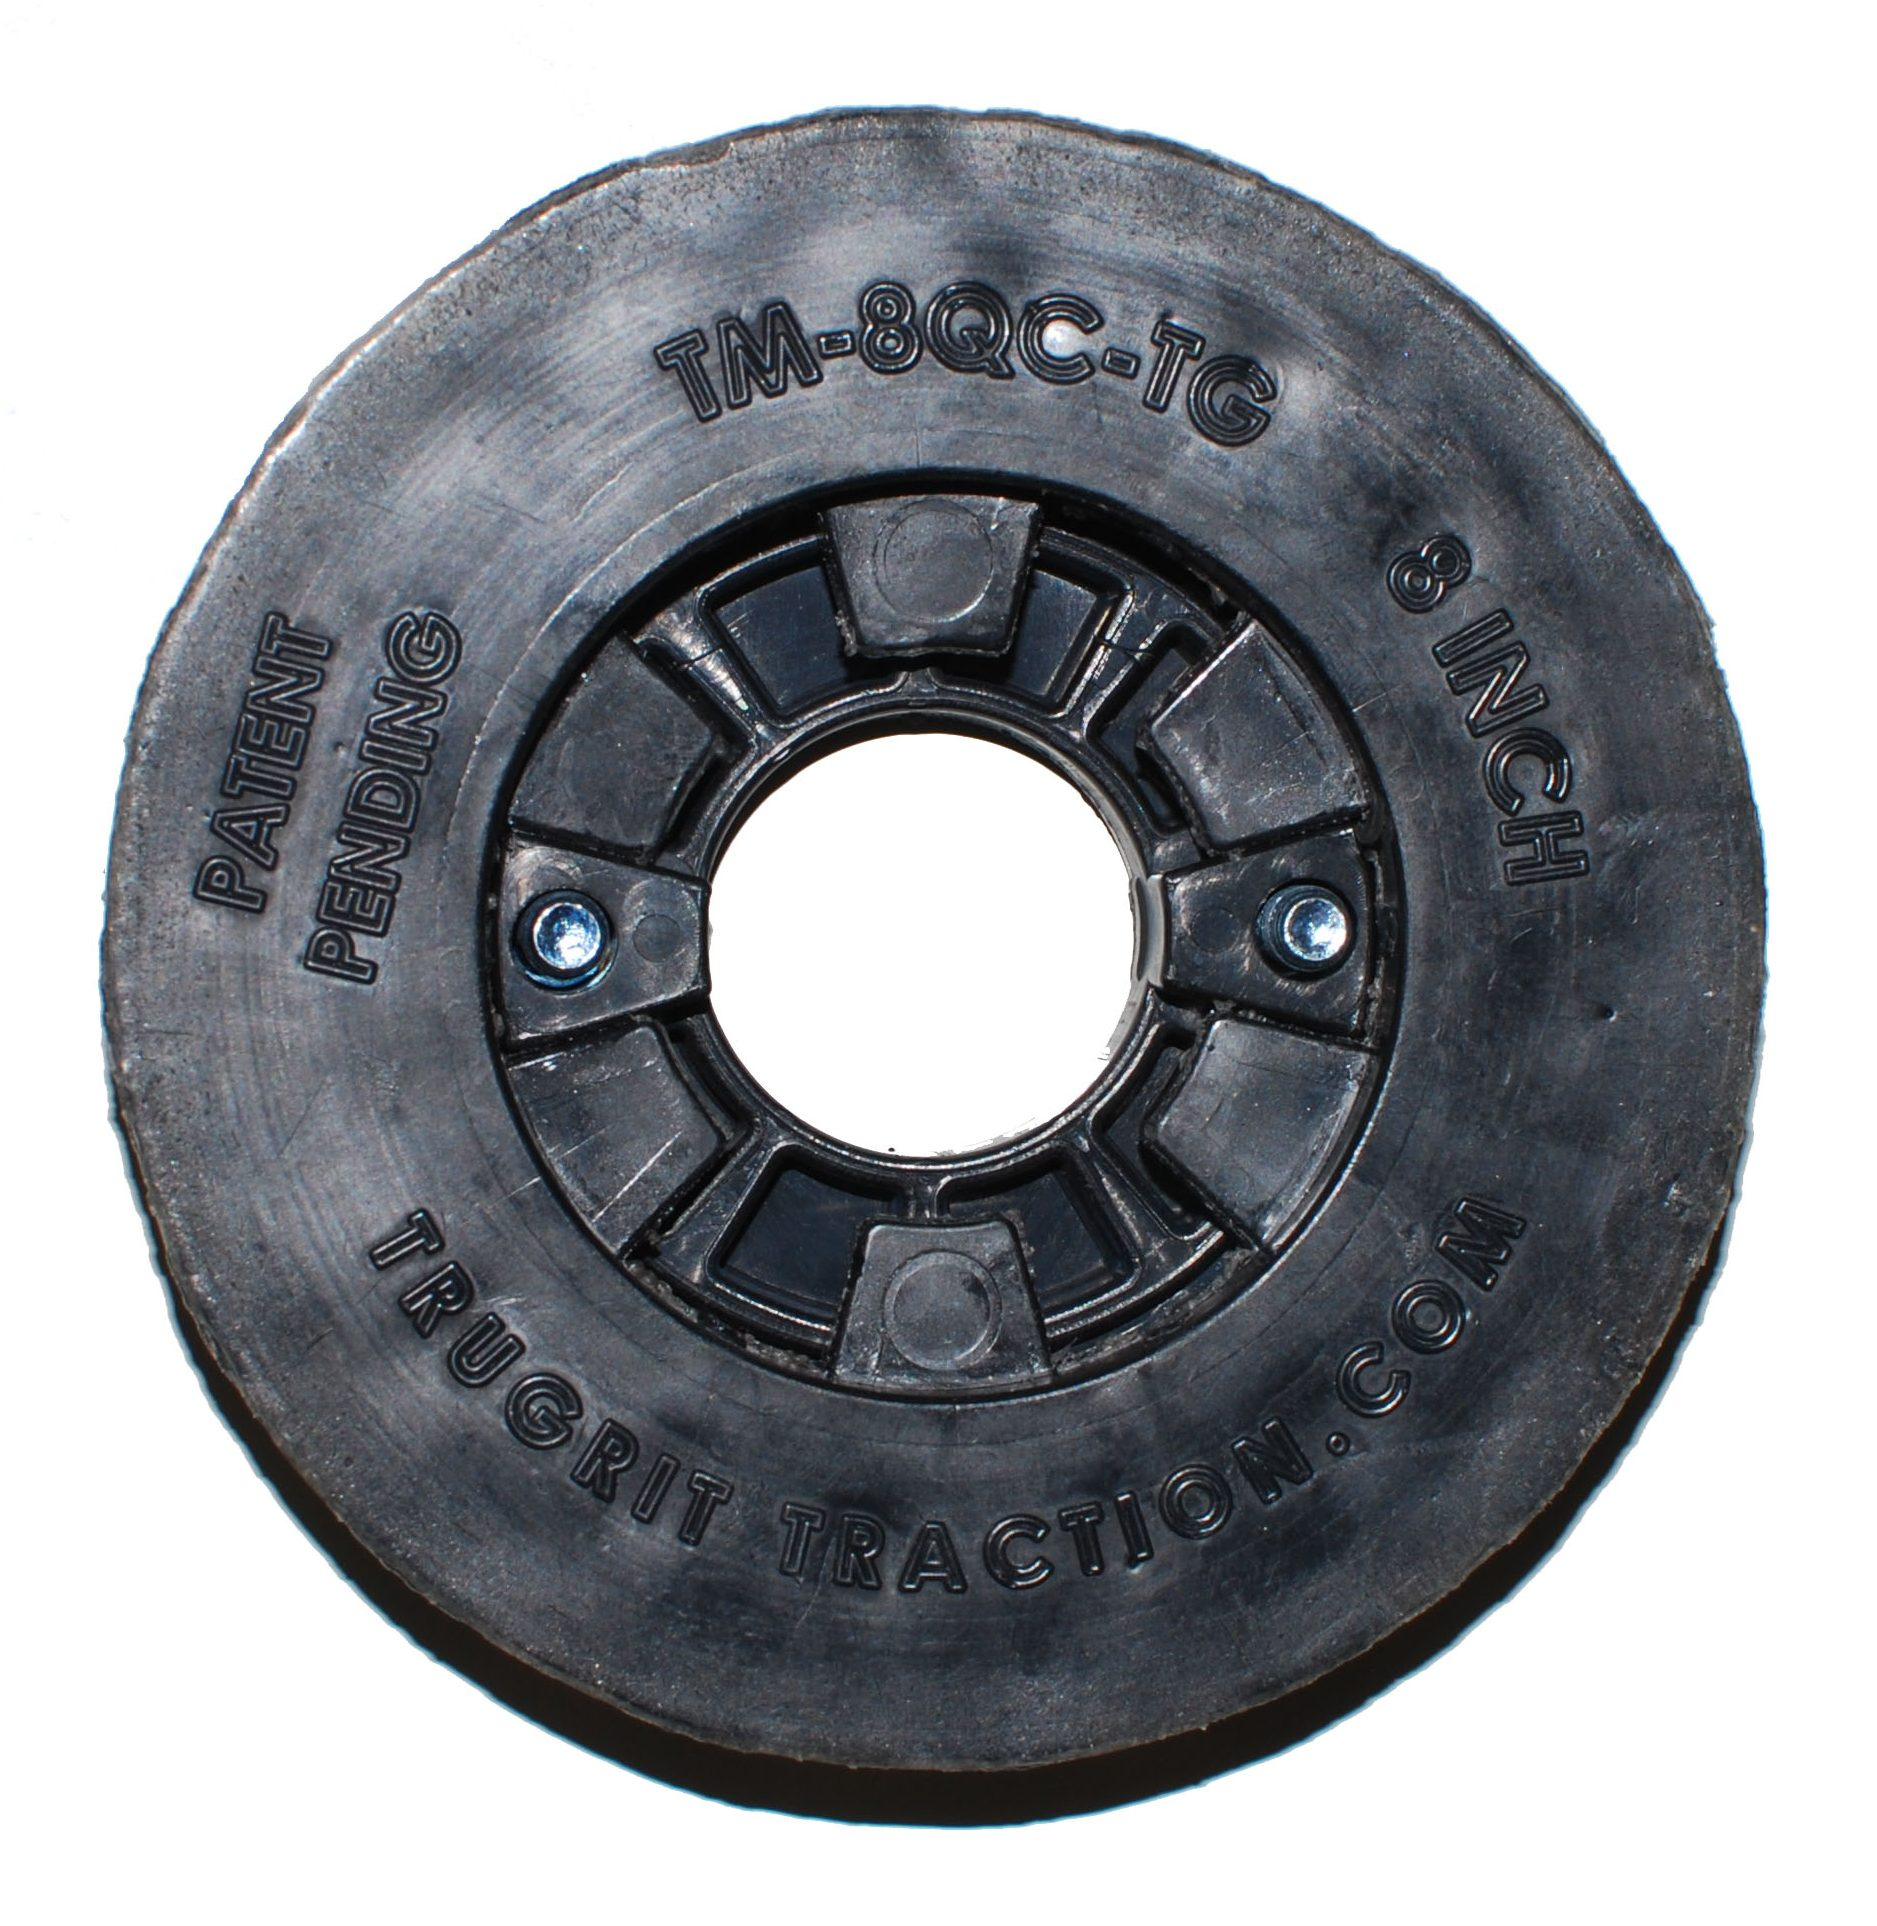 tg Ibak style wheel parts buy online